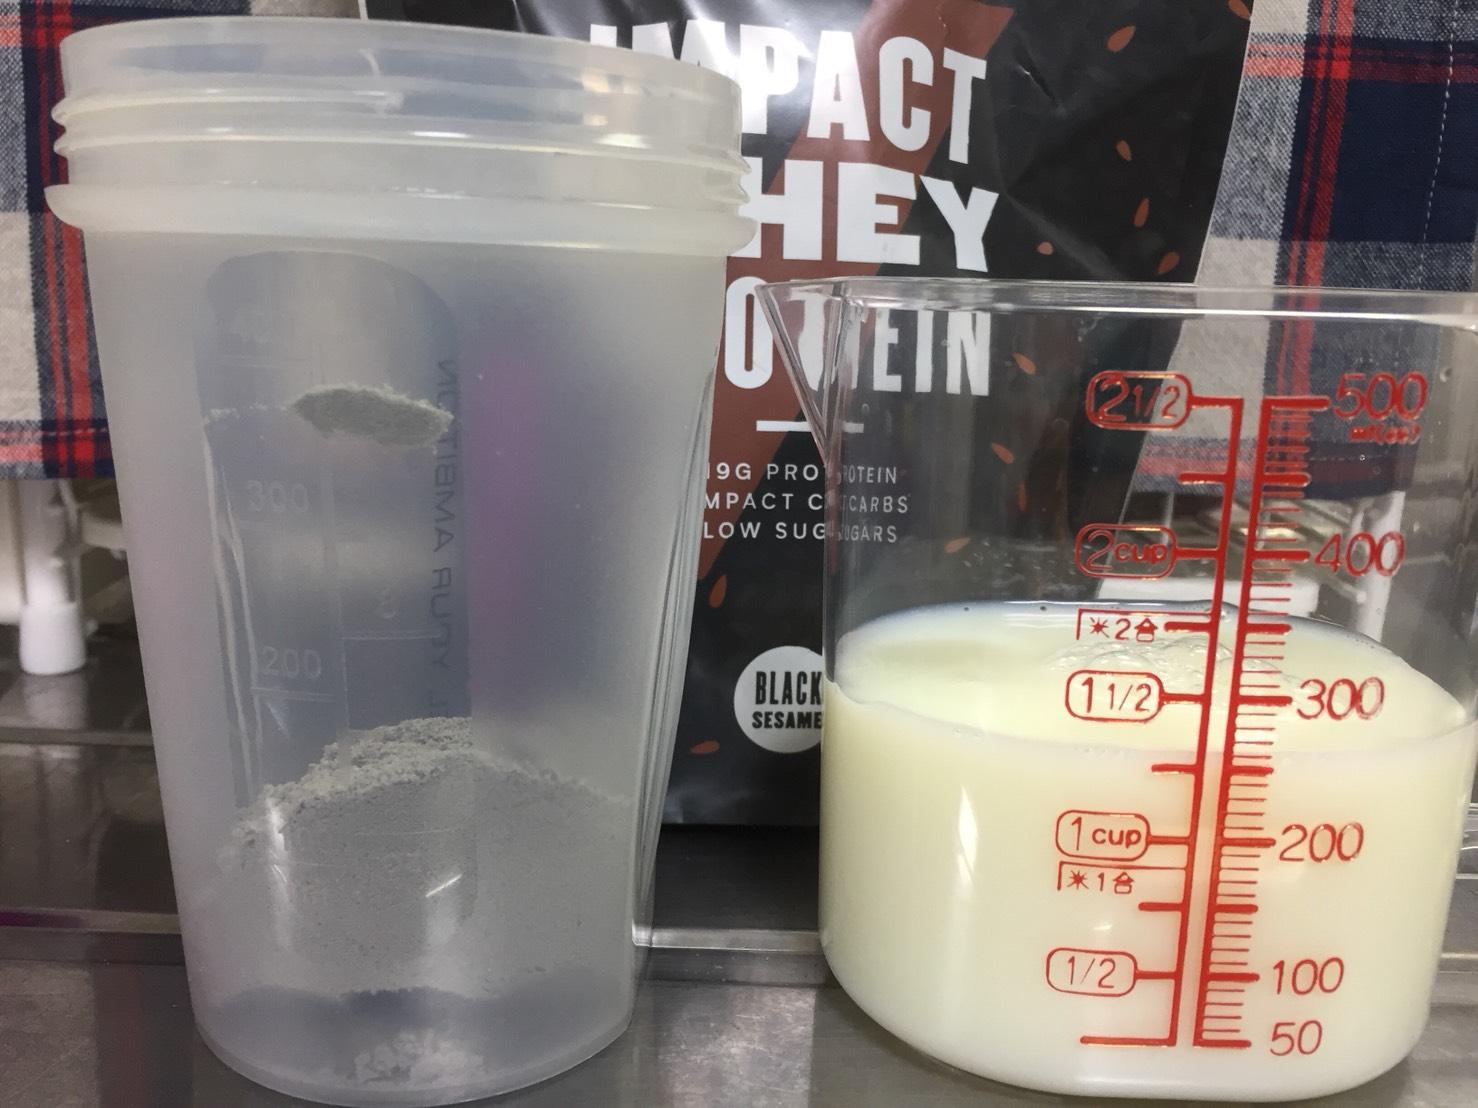 【WPC】Impactホエイプロテイン「黒ゴマ味」を250mlの無脂肪牛乳に溶かします